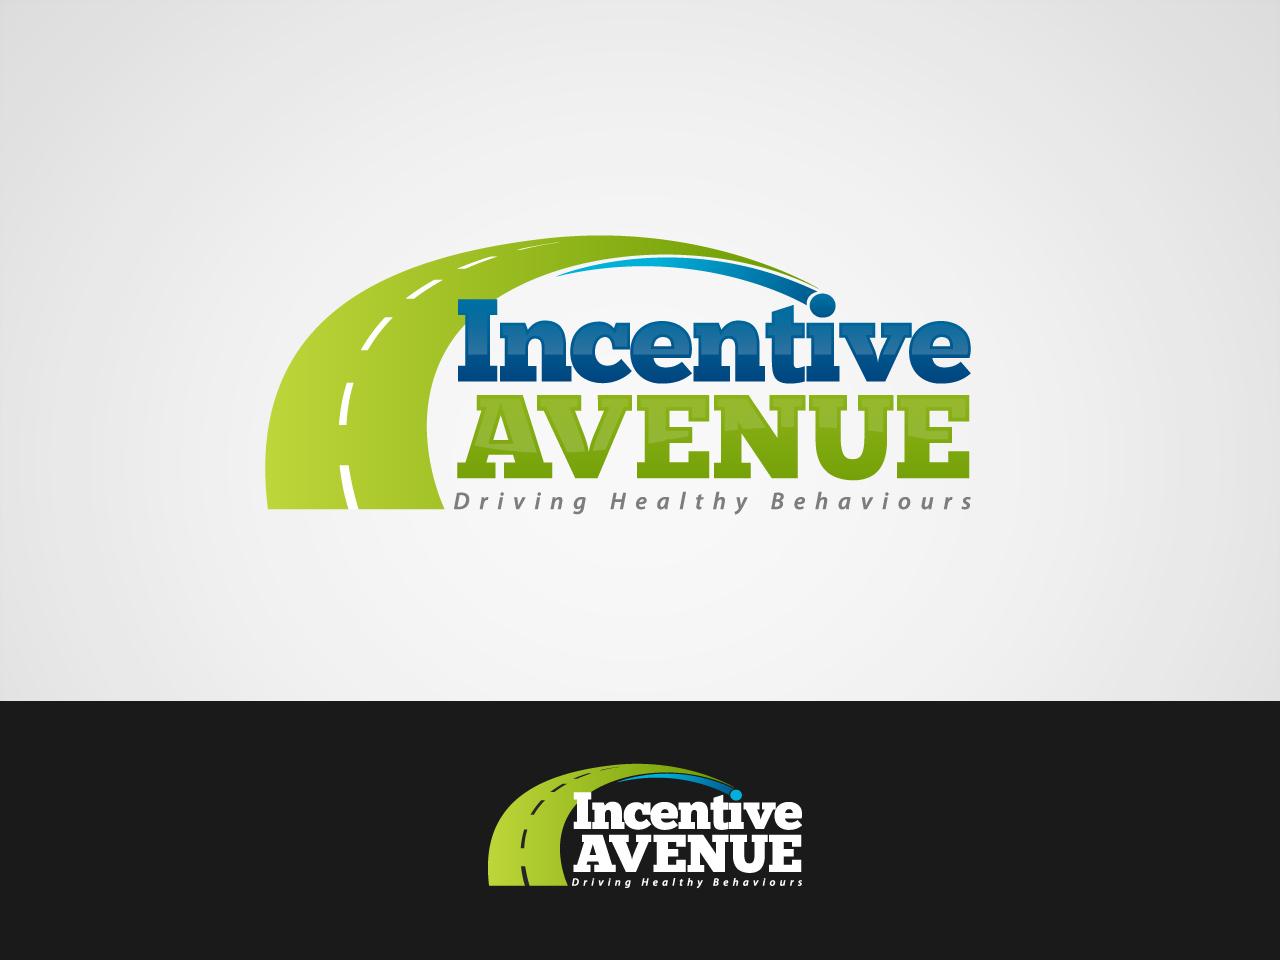 Logo Design by jpbituin - Entry No. 77 in the Logo Design Contest New Logo Design for Incentive Avenue.